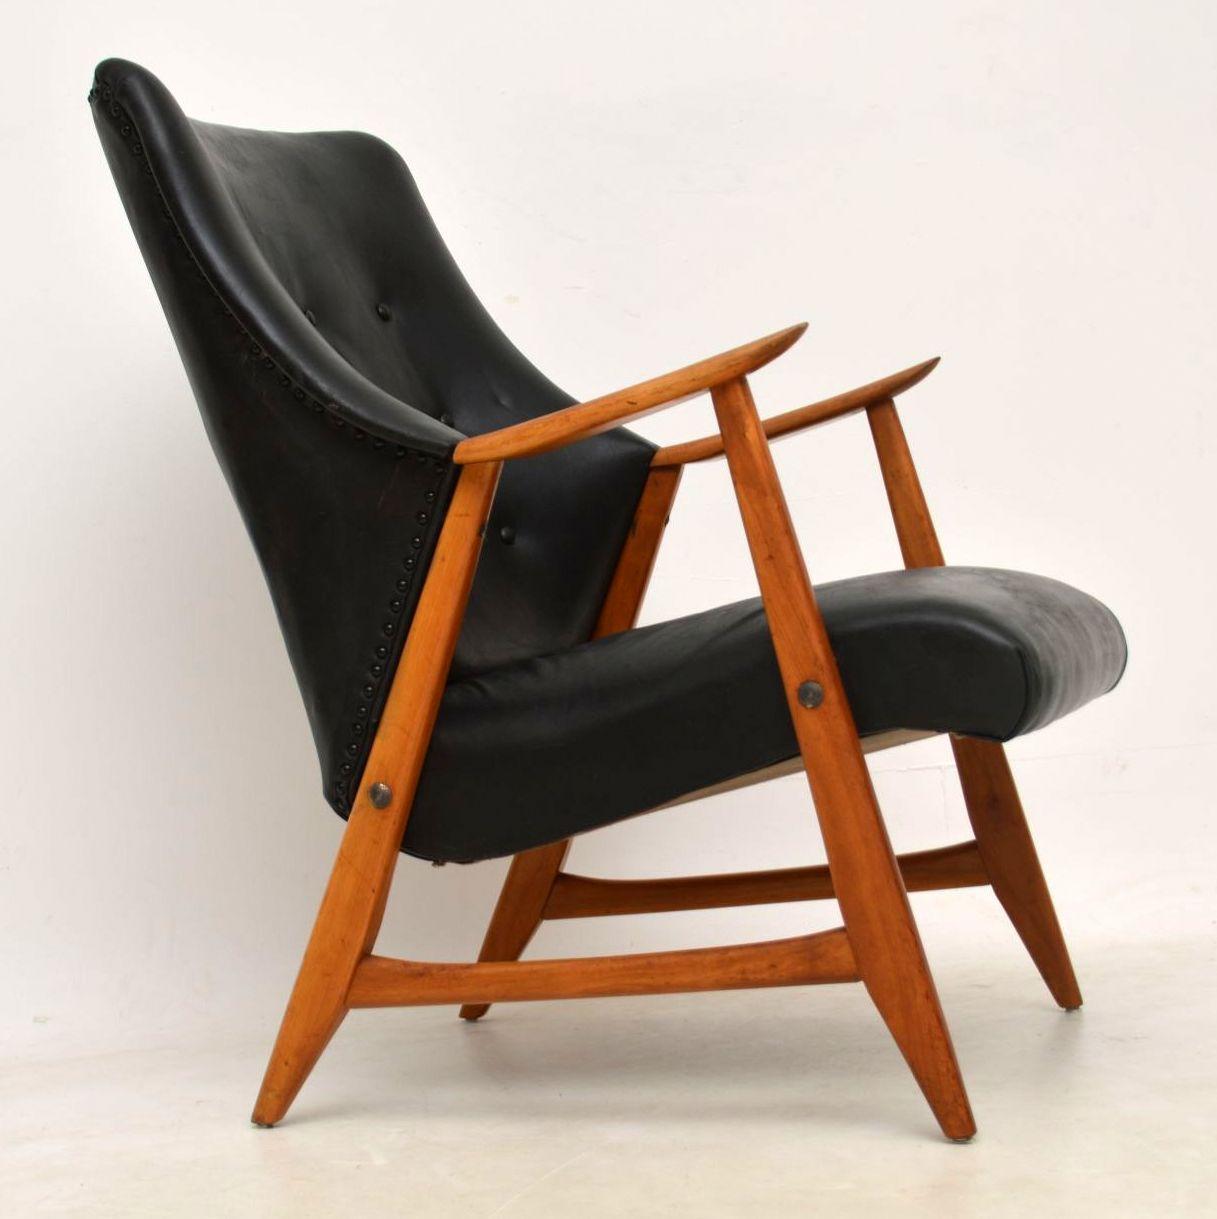 1960's Danish Vintage Leather & Teak Armchair - 1960's Danish Vintage Leather & Teak Armchair Interior Boutiques